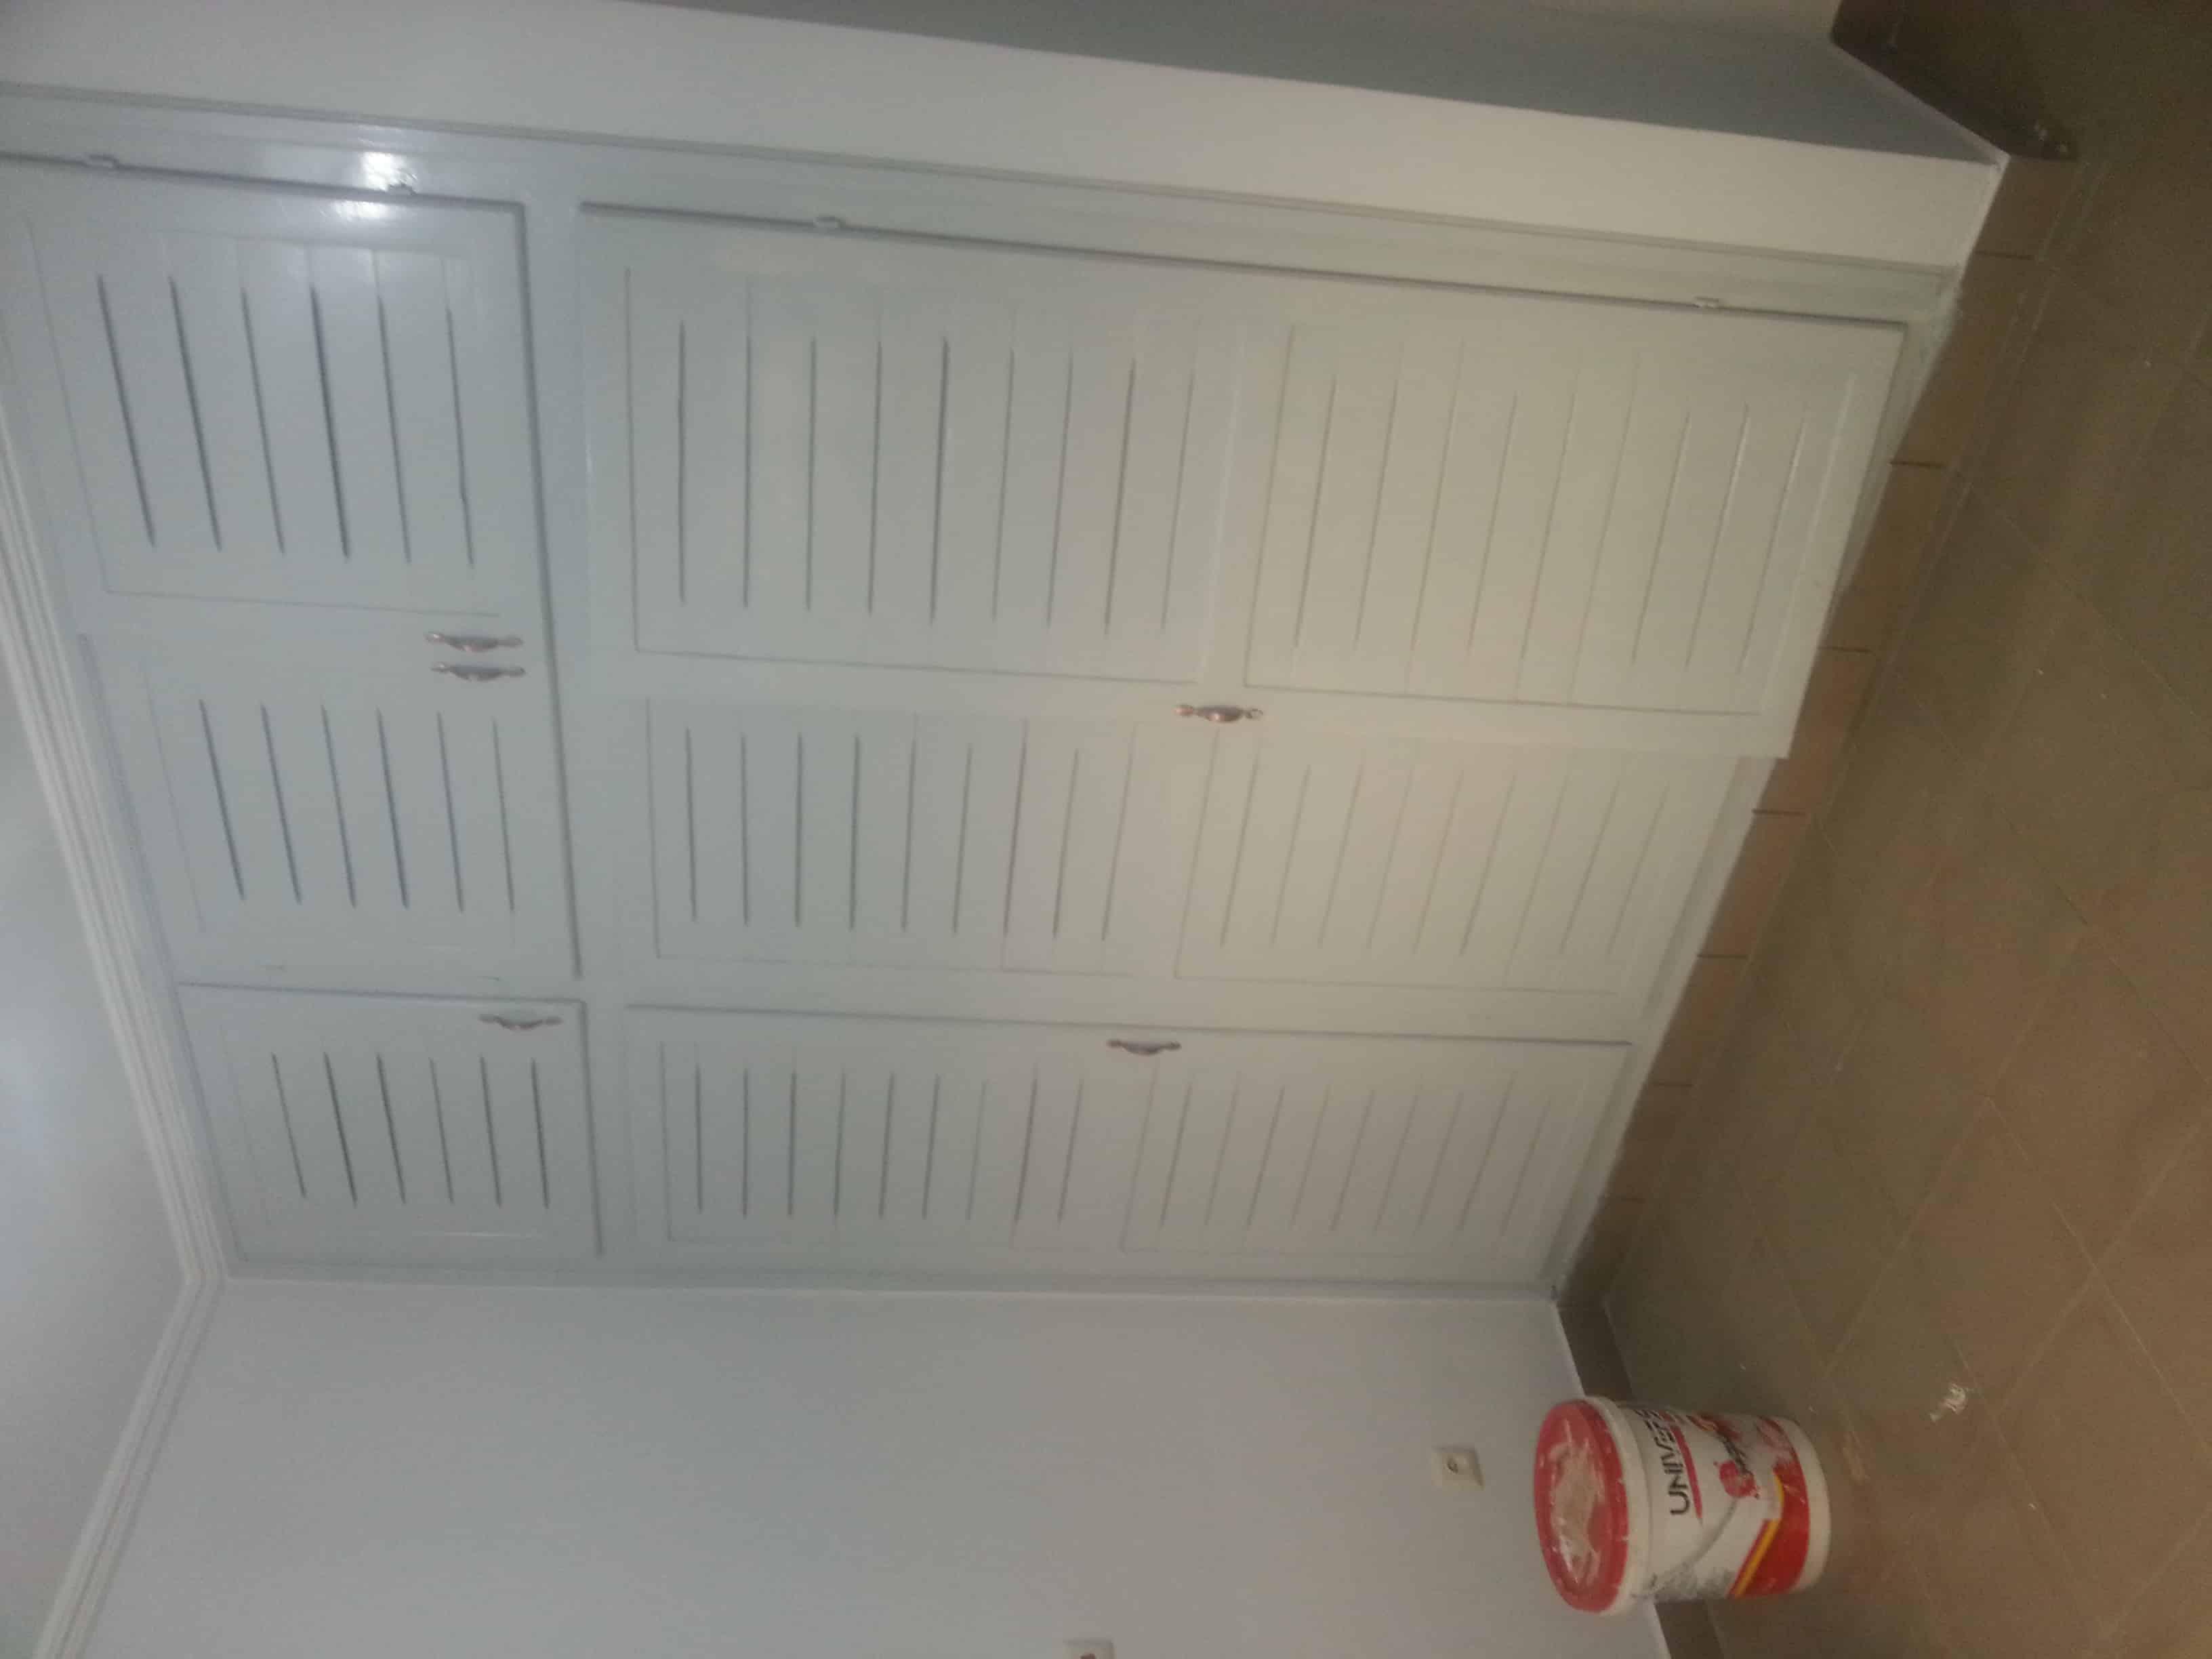 Apartment to rent - Yaoundé, Mimboman IV, maetur - 1 living room(s), 2 bedroom(s), 2 bathroom(s) - 150 000 FCFA / month